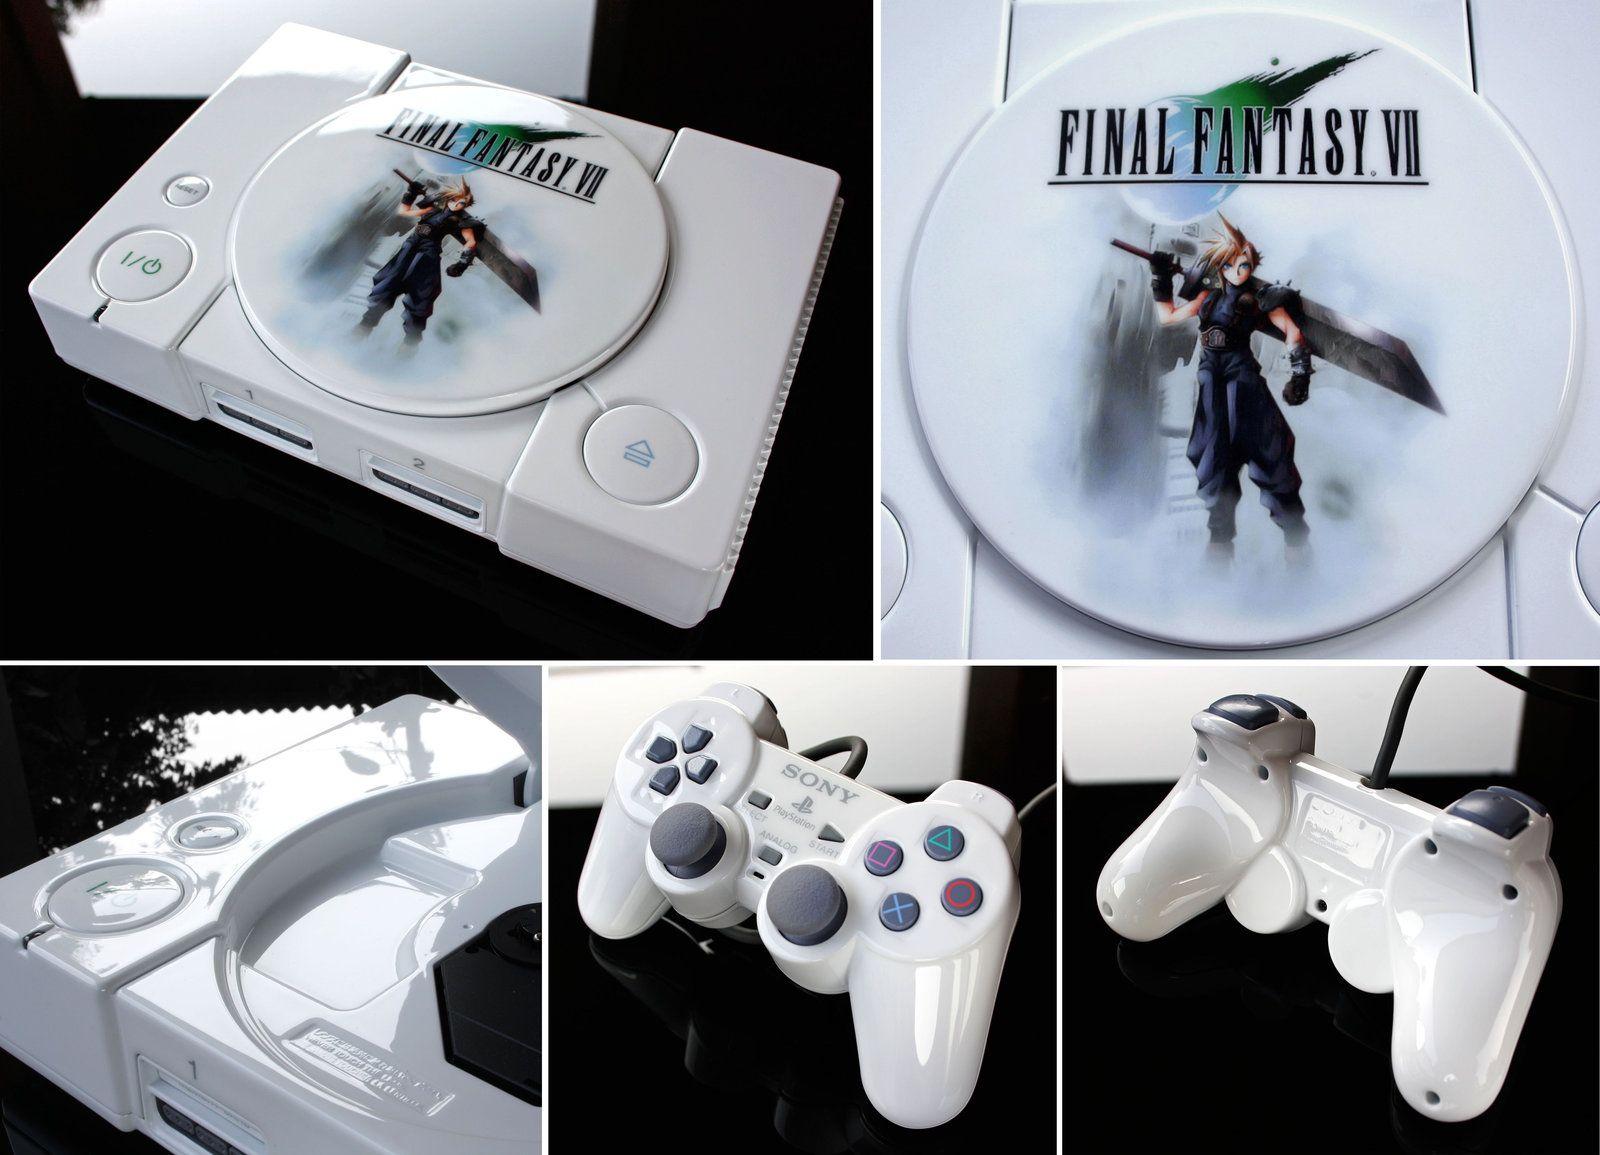 Custom Final Fantasy Vii Ps1 Sony Playstation By Zoki64